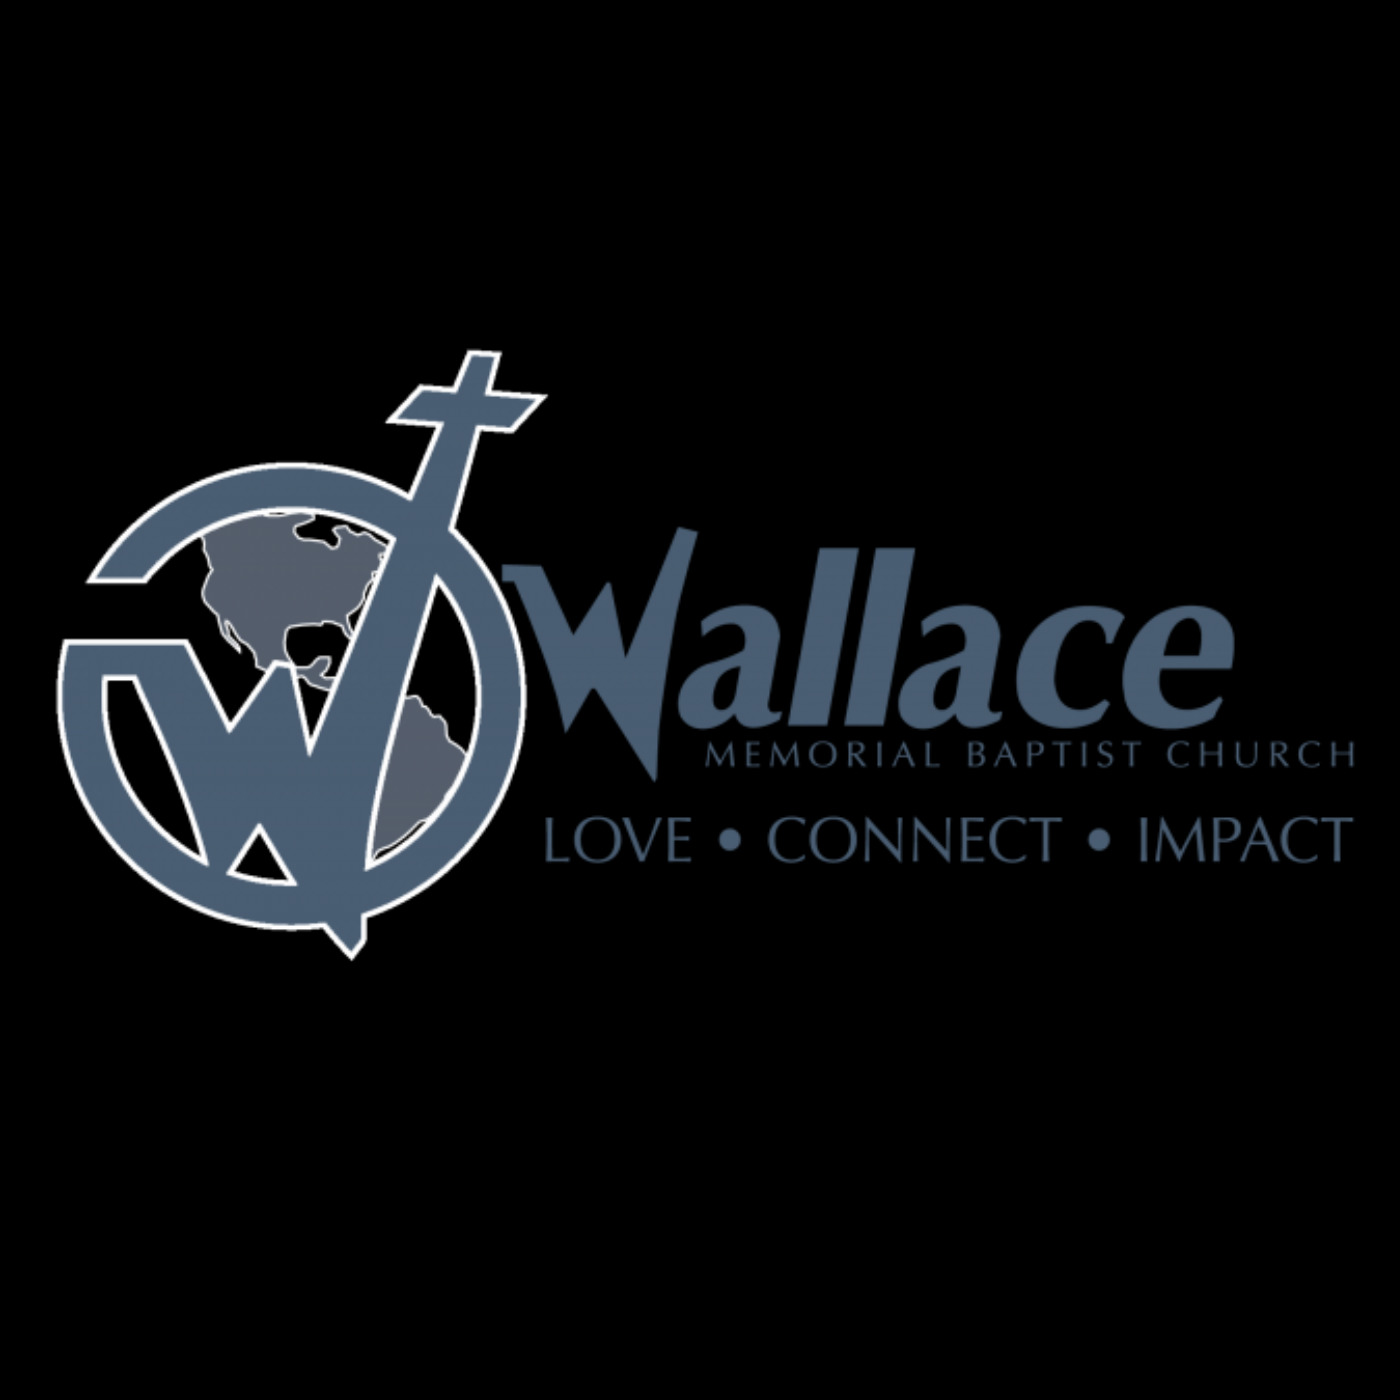 Wallace Memorial Baptist Church Sermon Videos